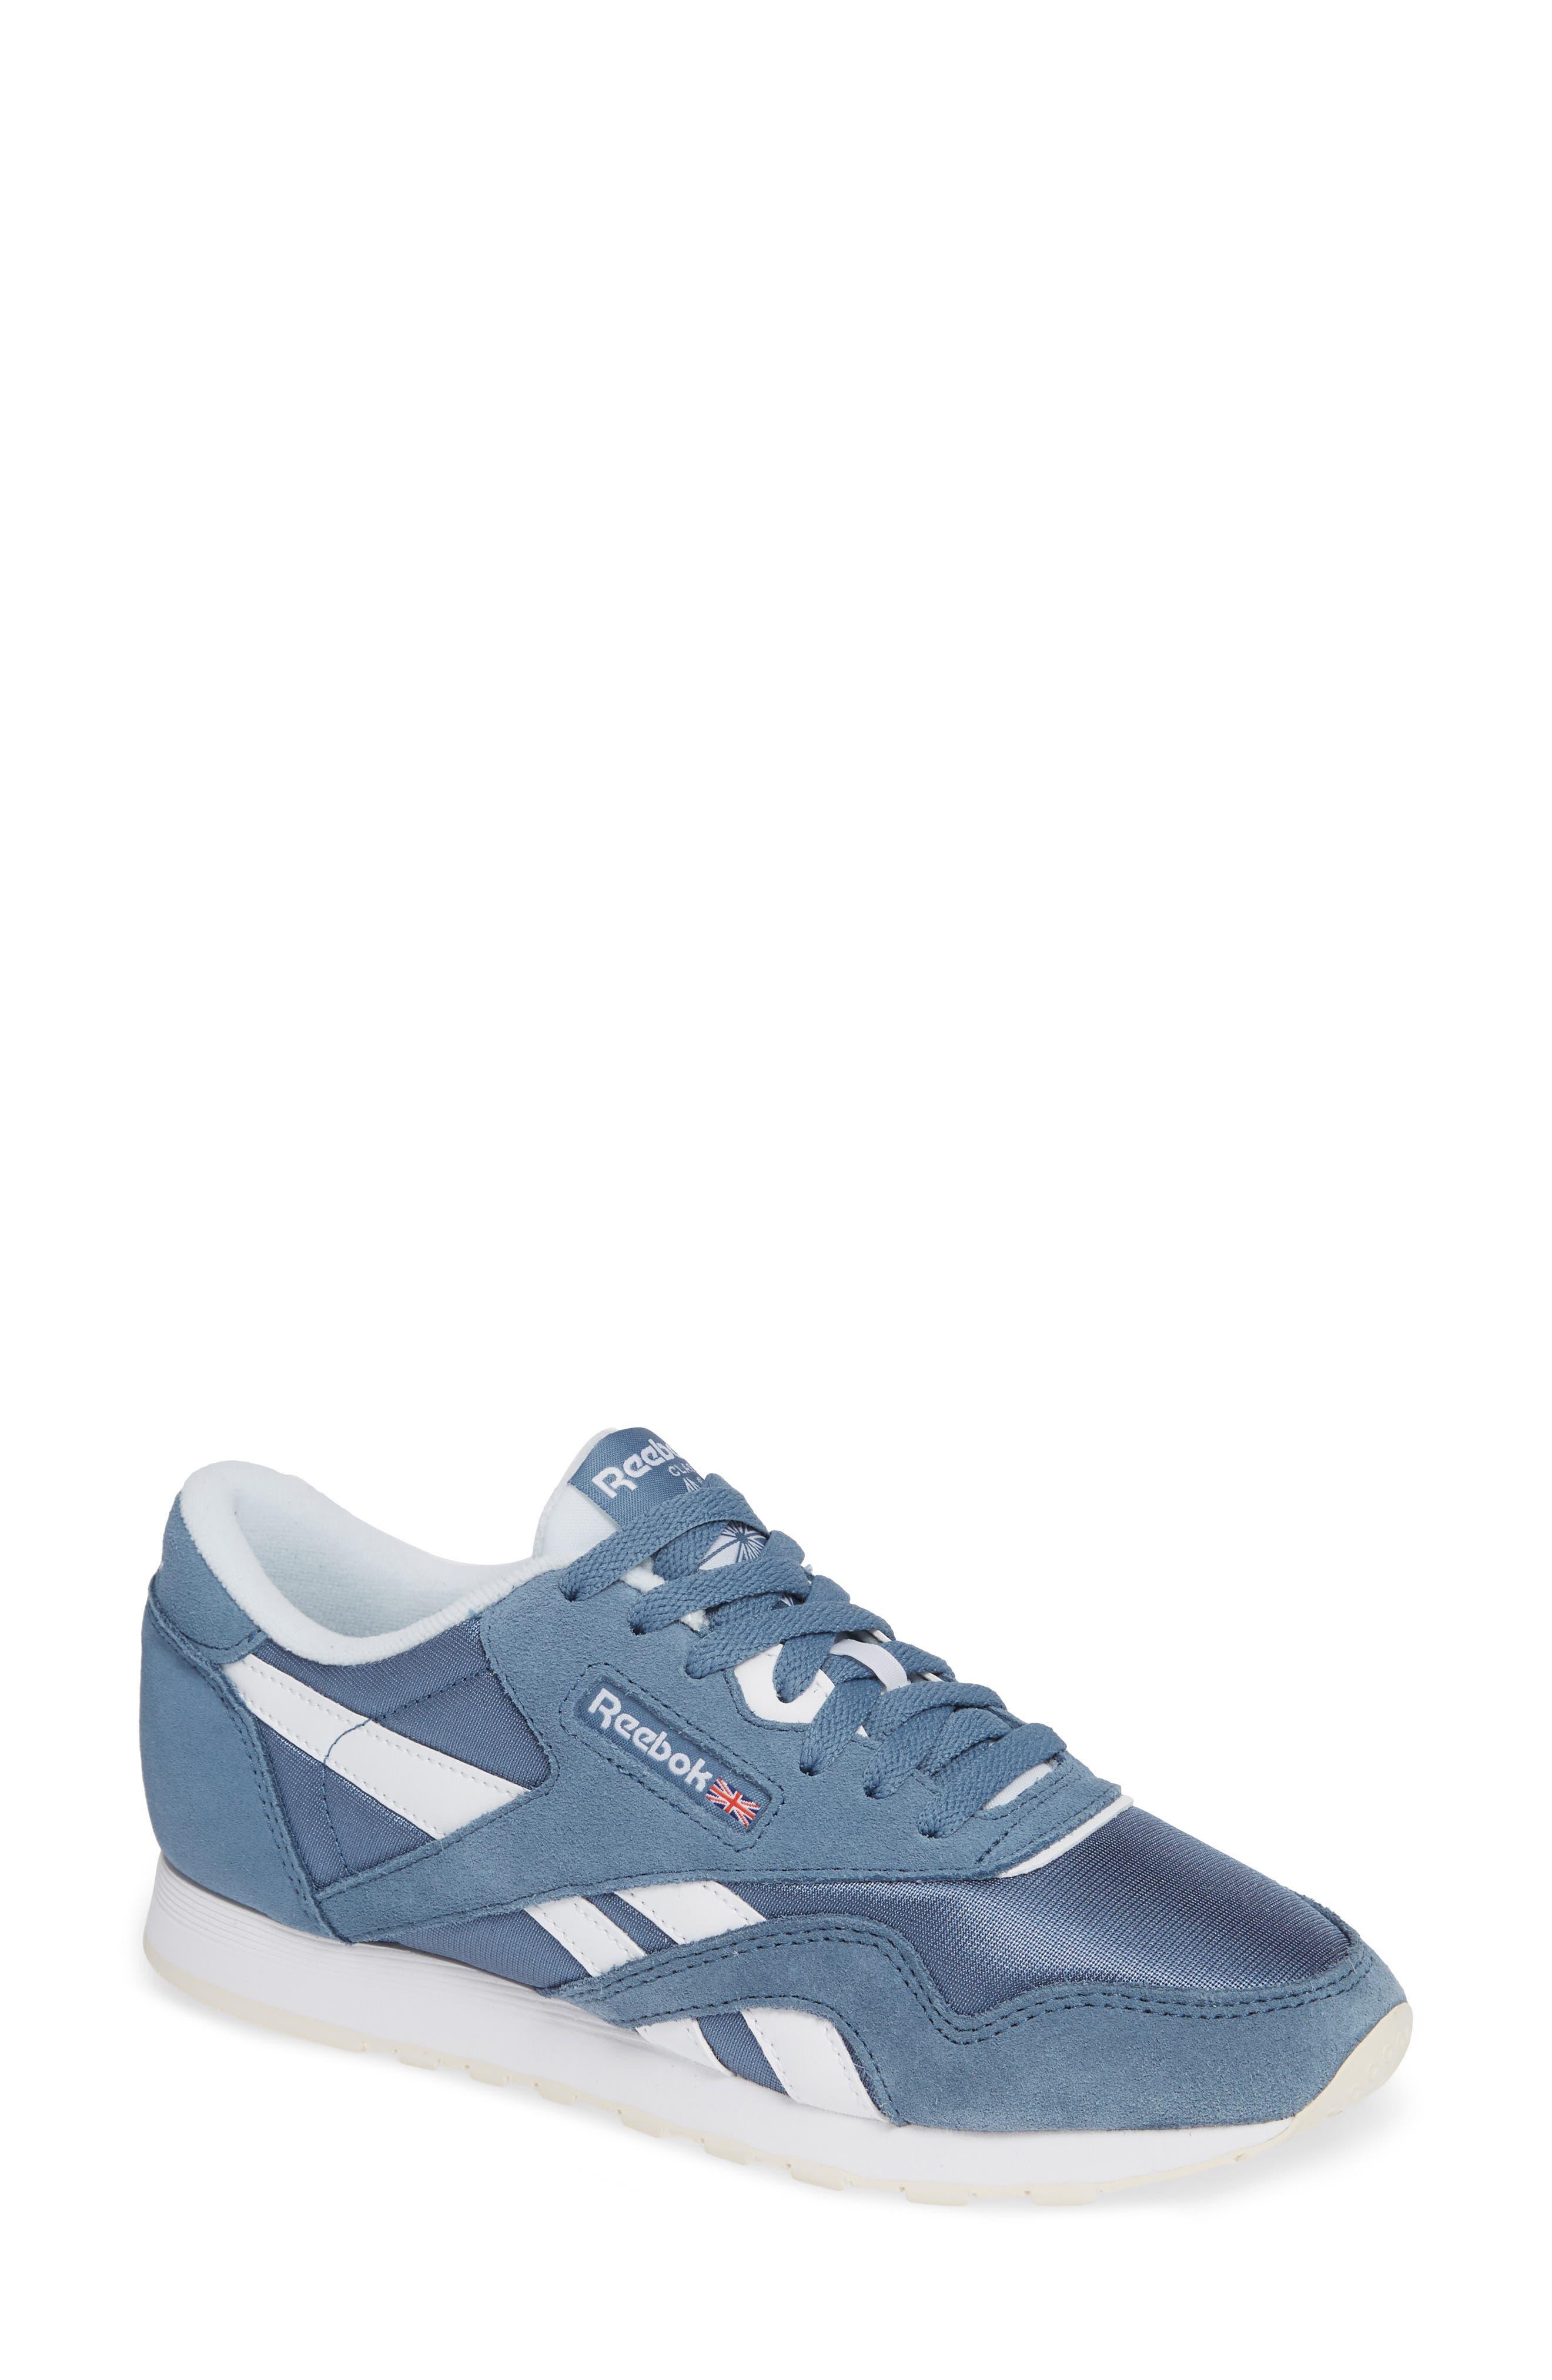 Classic Sneaker,                             Main thumbnail 1, color,                             BLUE SLATE/ WHITE/ CHALK